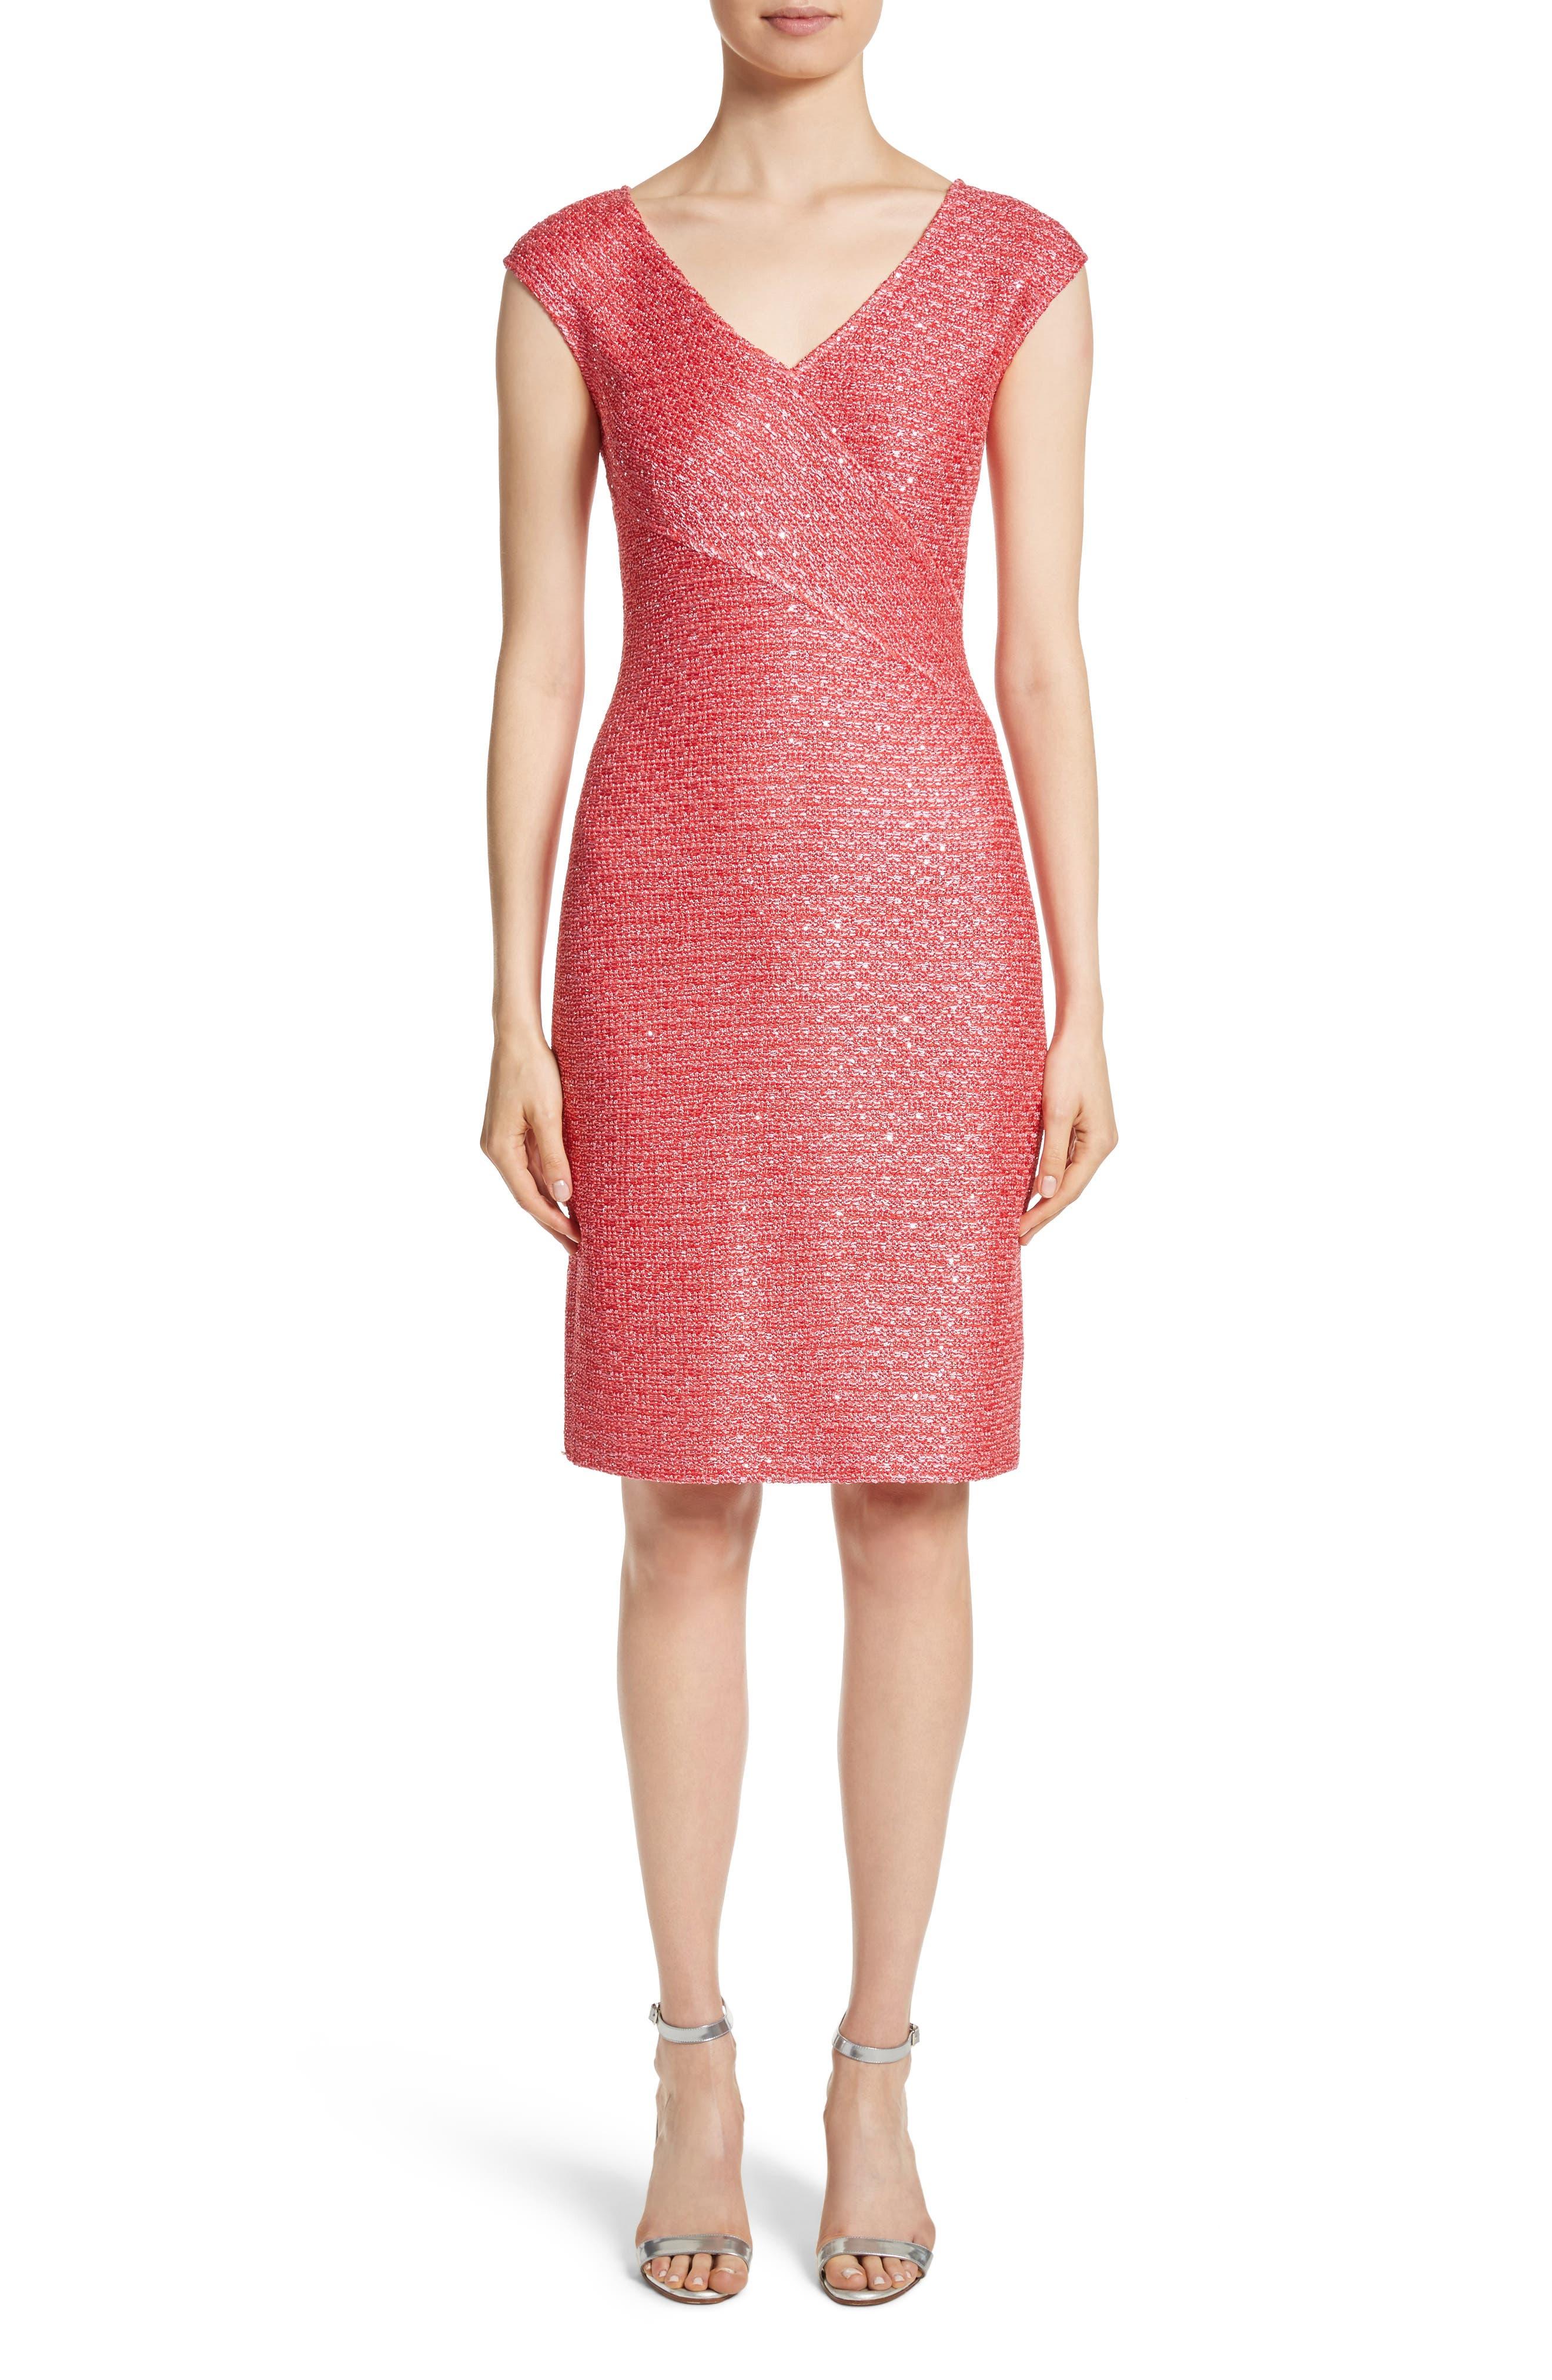 ST. JOHN COLLECTION Hansh Knit Dress, Main, color, 950